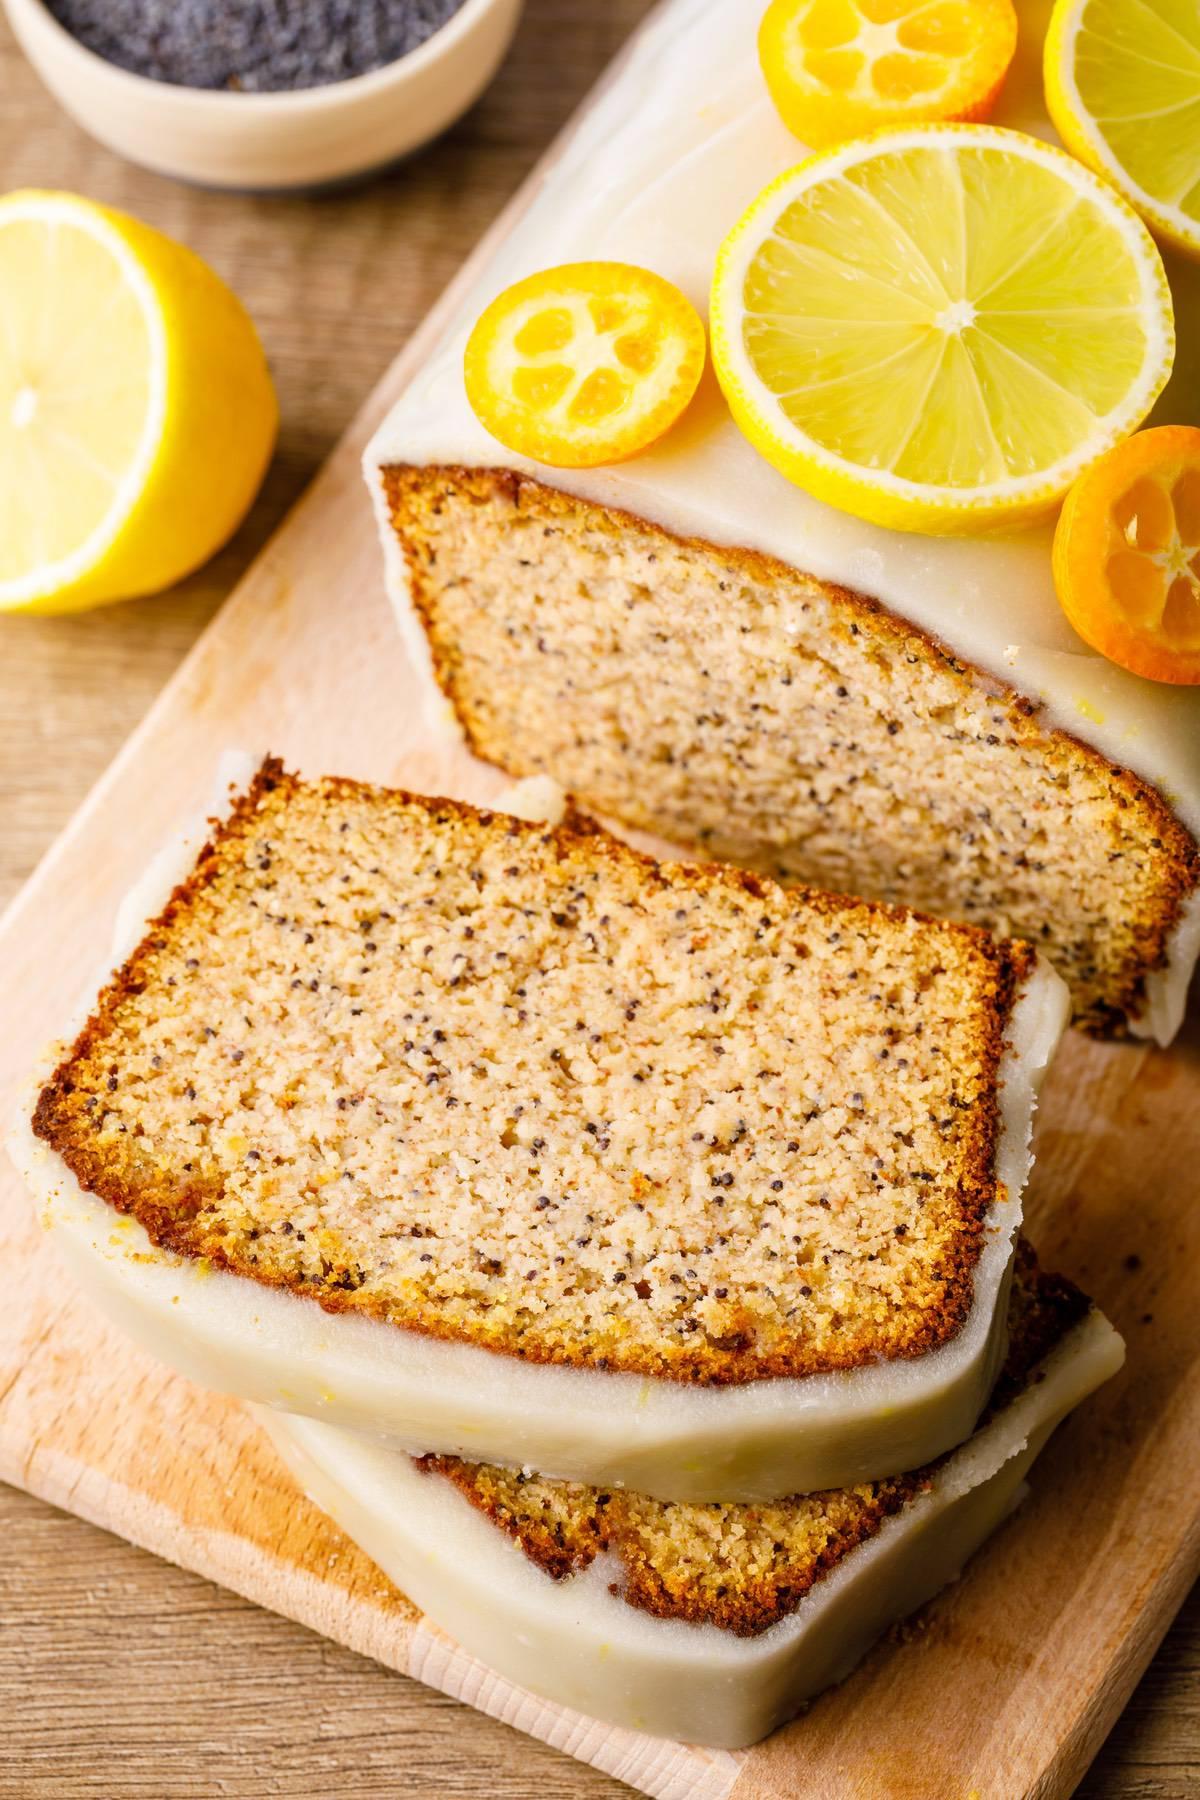 Home.fit lemon-poppy-seed-paleo-bread-7 Lemon Poppy Seed Bread (Low Carb)